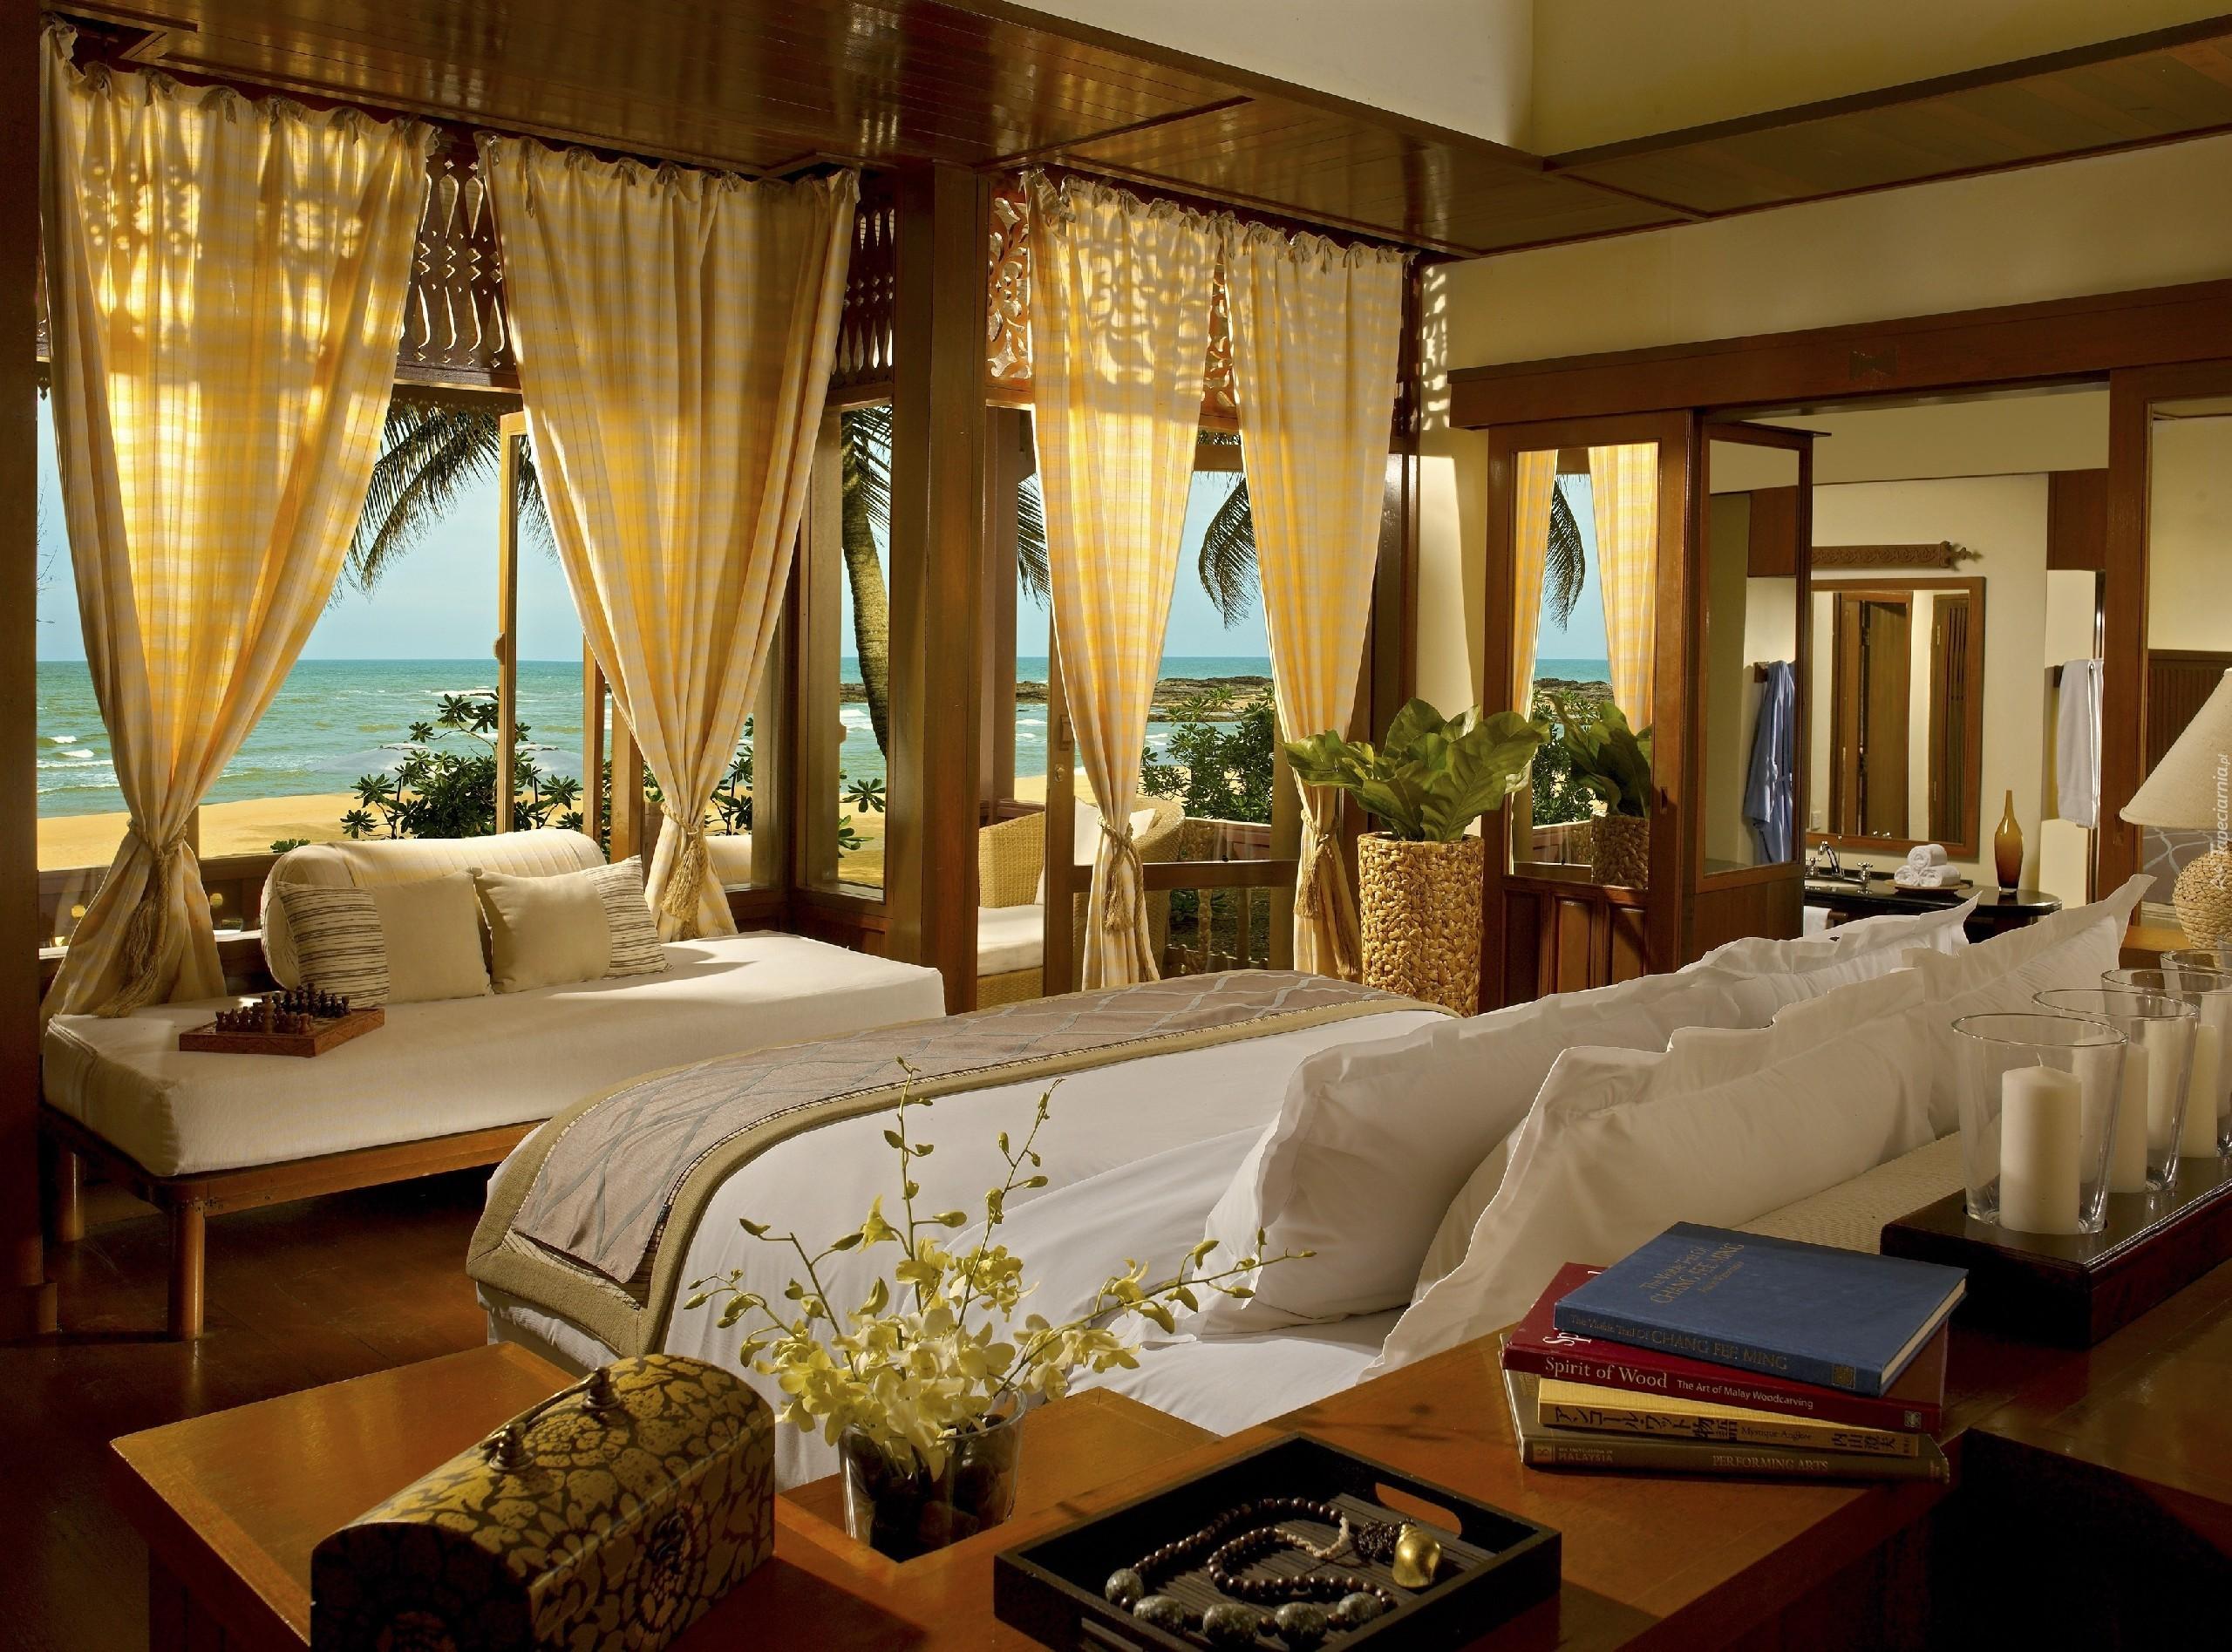 luxury hotel room hd - photo #24